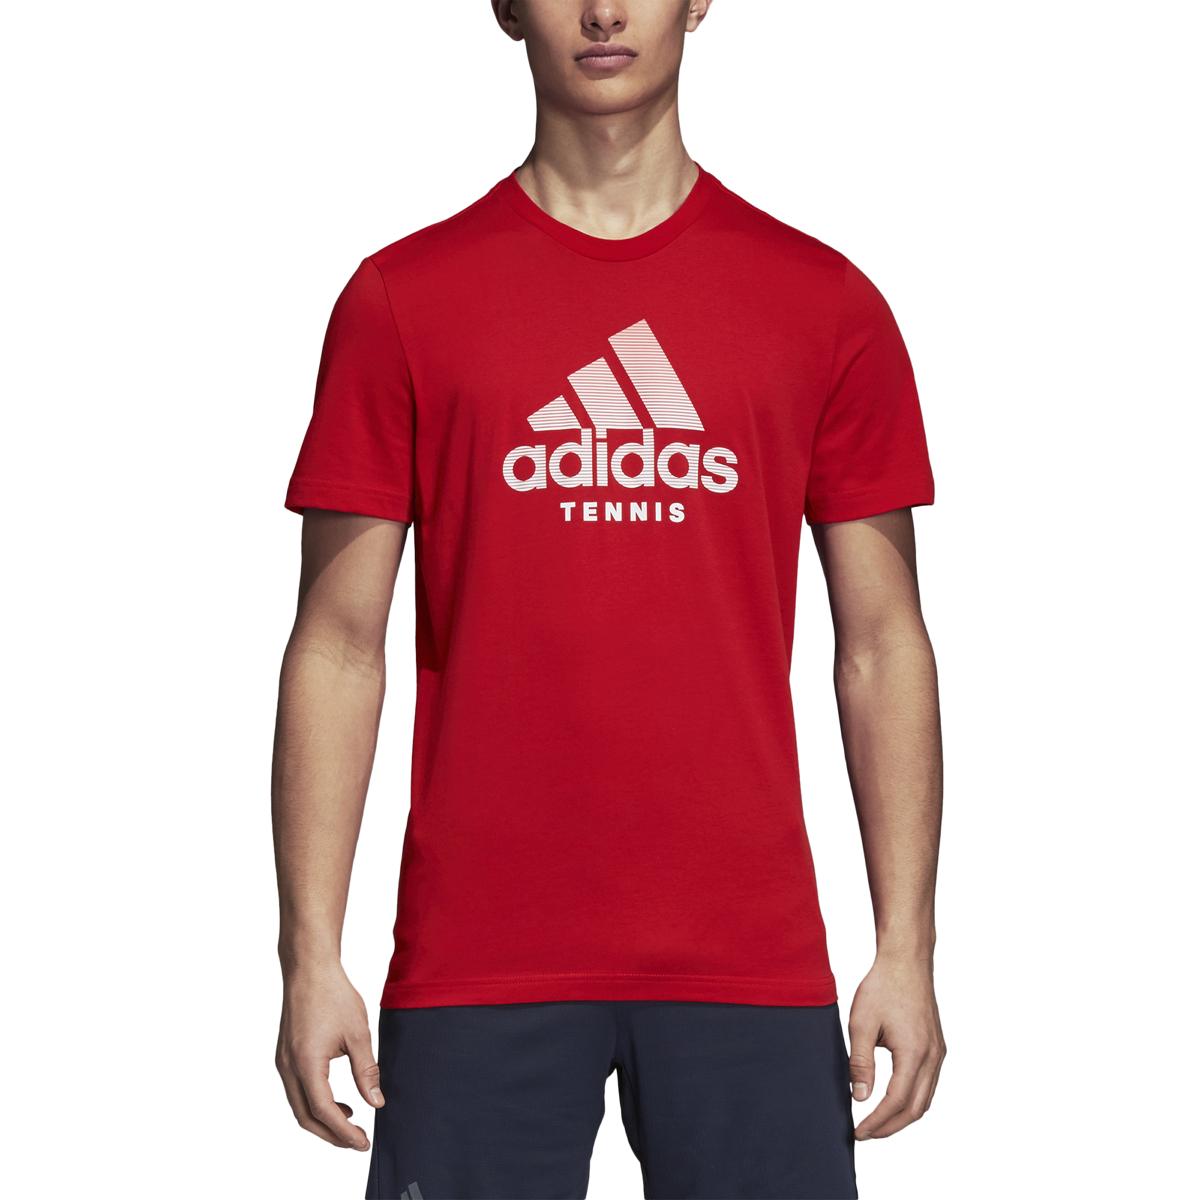 adidas tennis logo t shirt